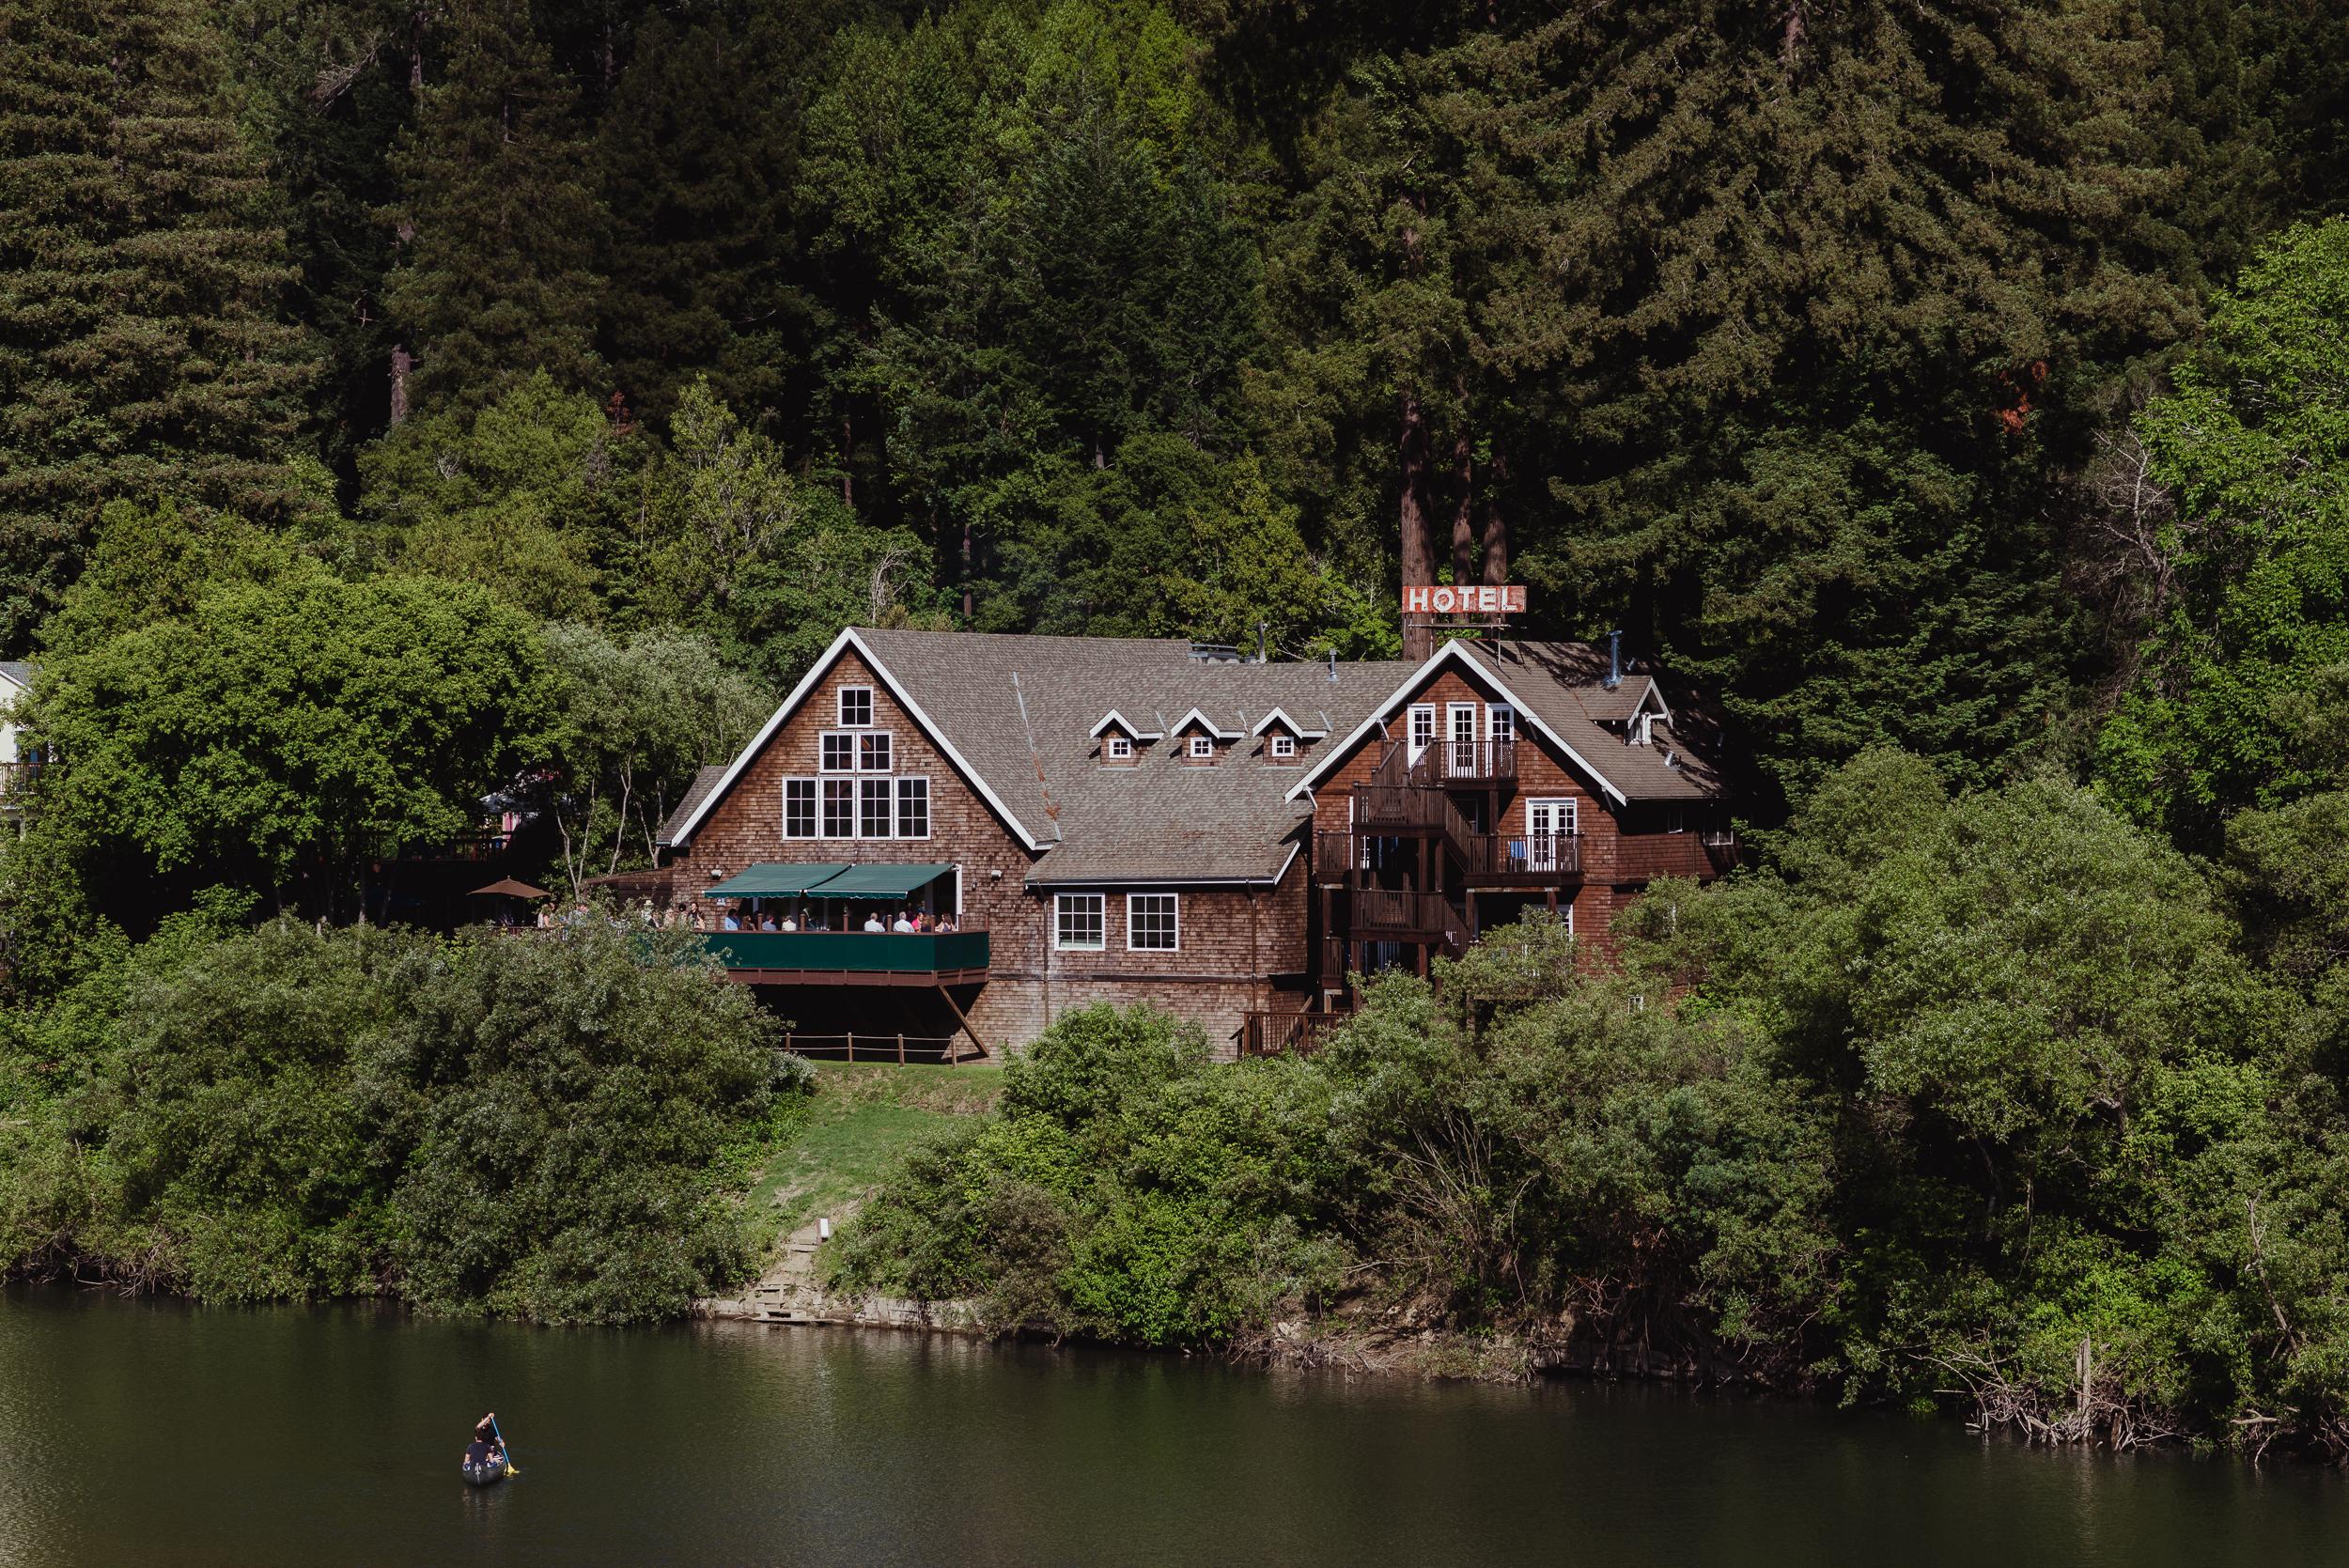 003-highland-dell-lodge-russian-river-wedding-vivianchen-016.jpg